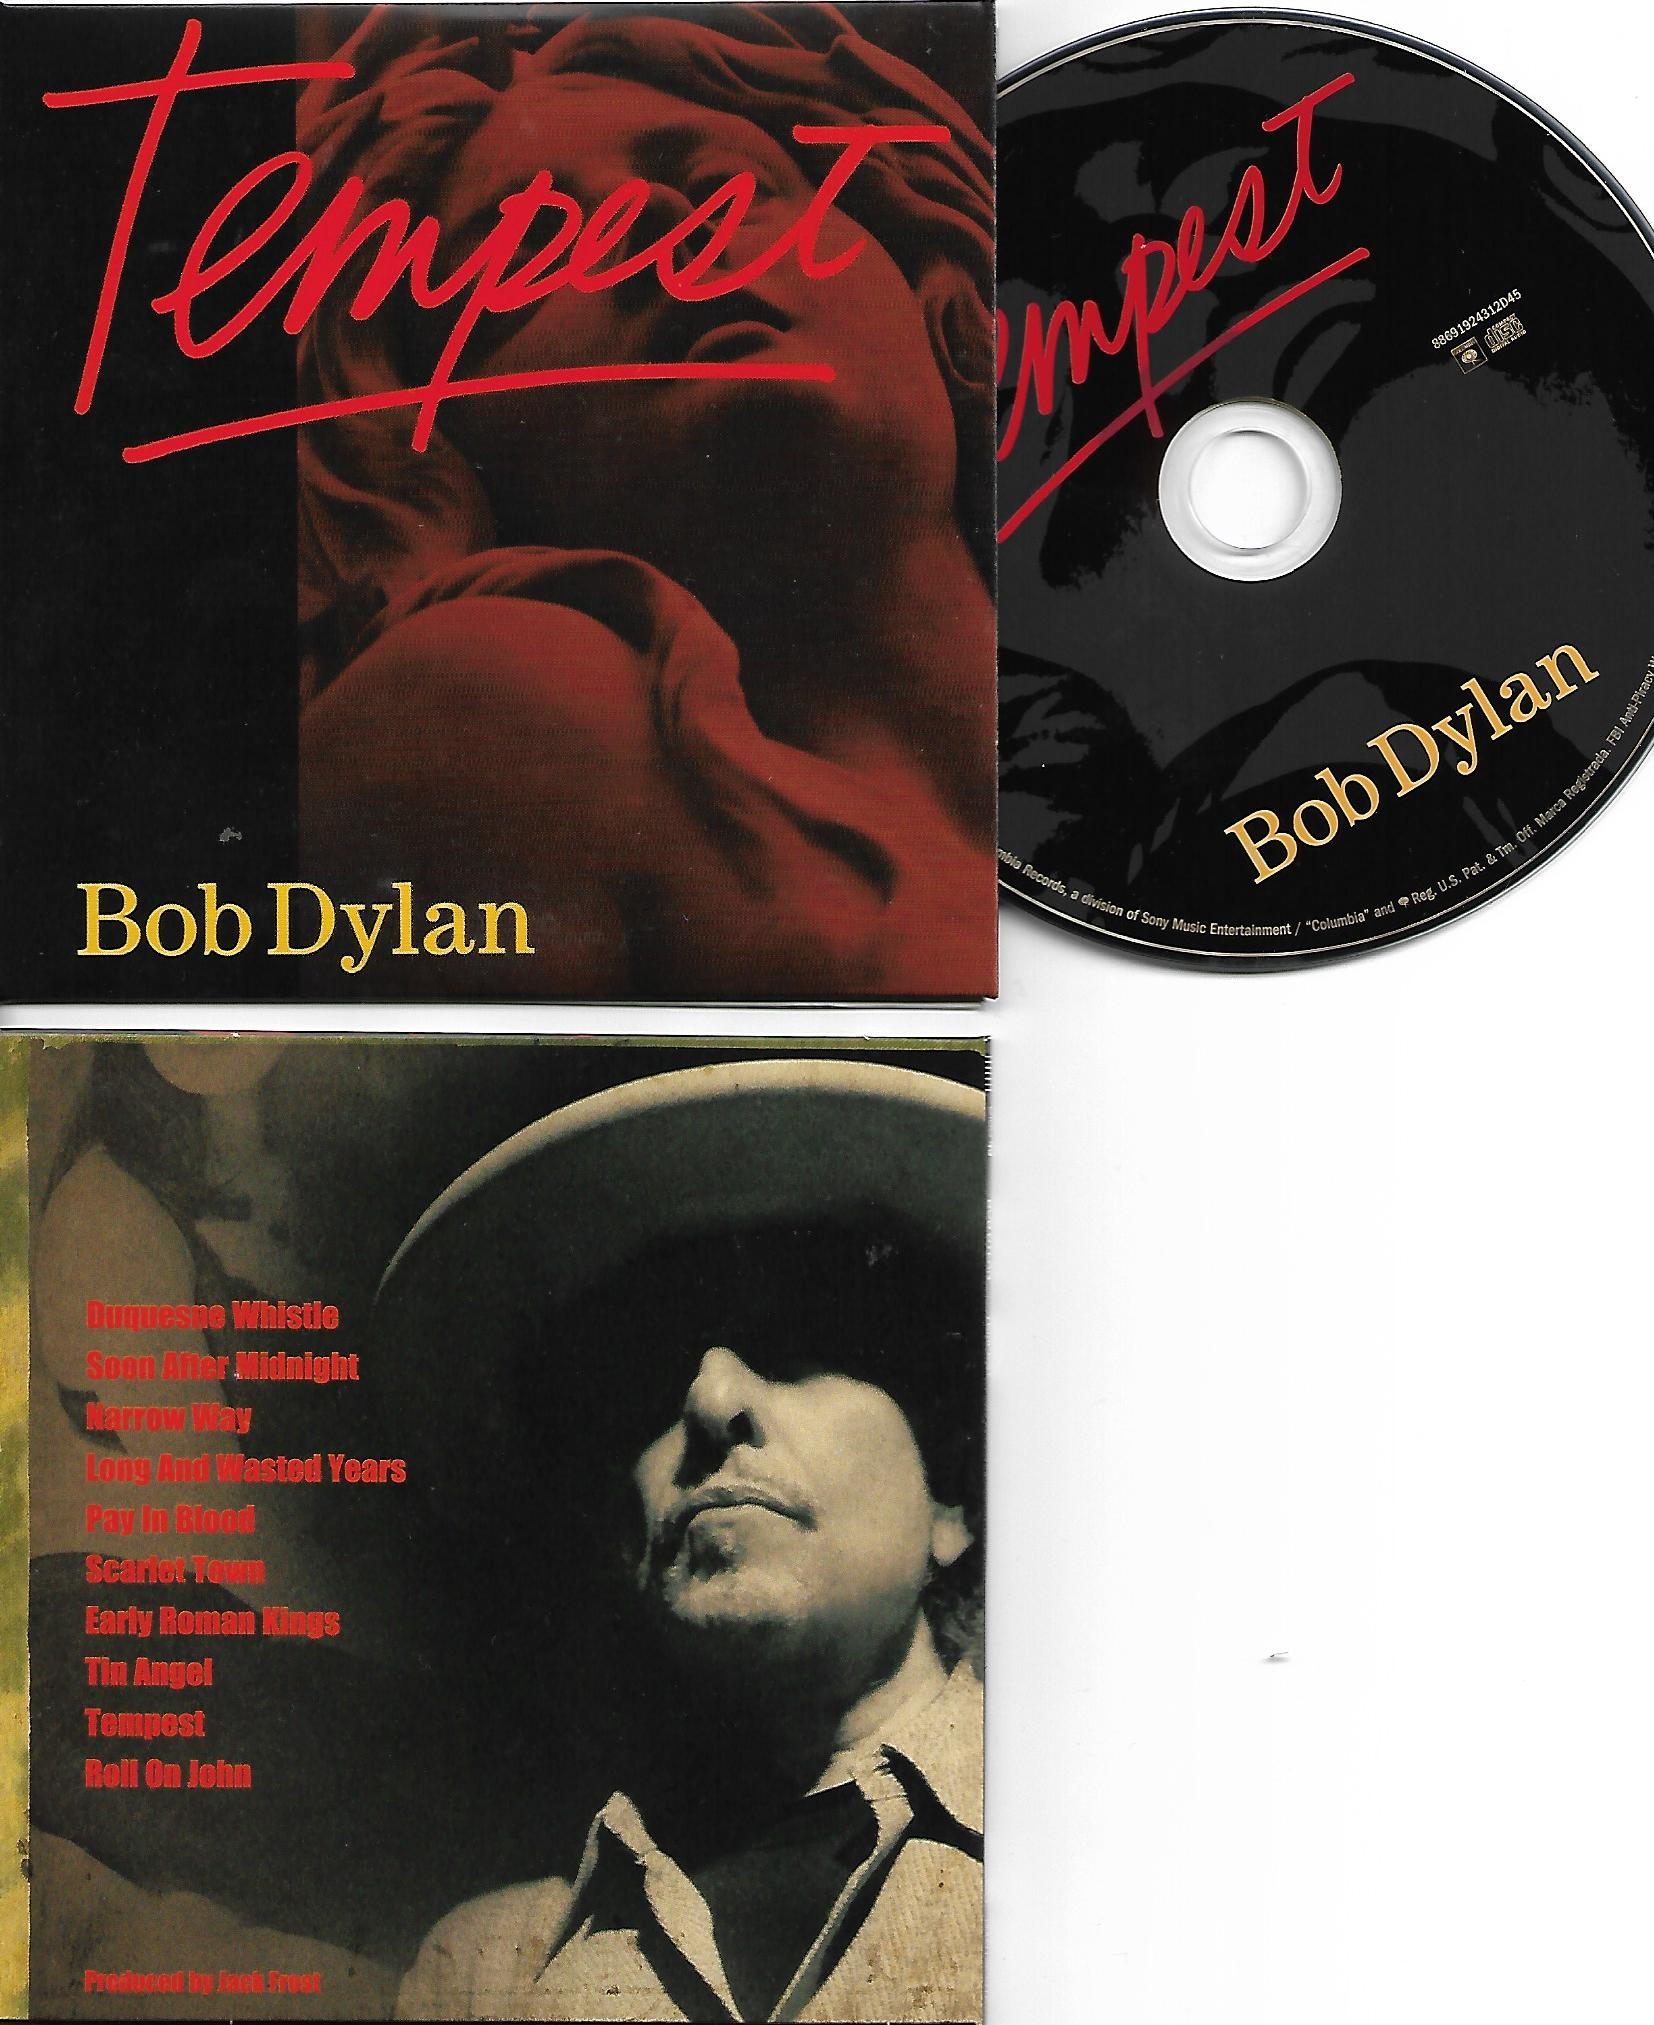 BOB DYLAN - Tempest (2012) - MINI LP REPLICA CARD BOARD SLEEVE - CD